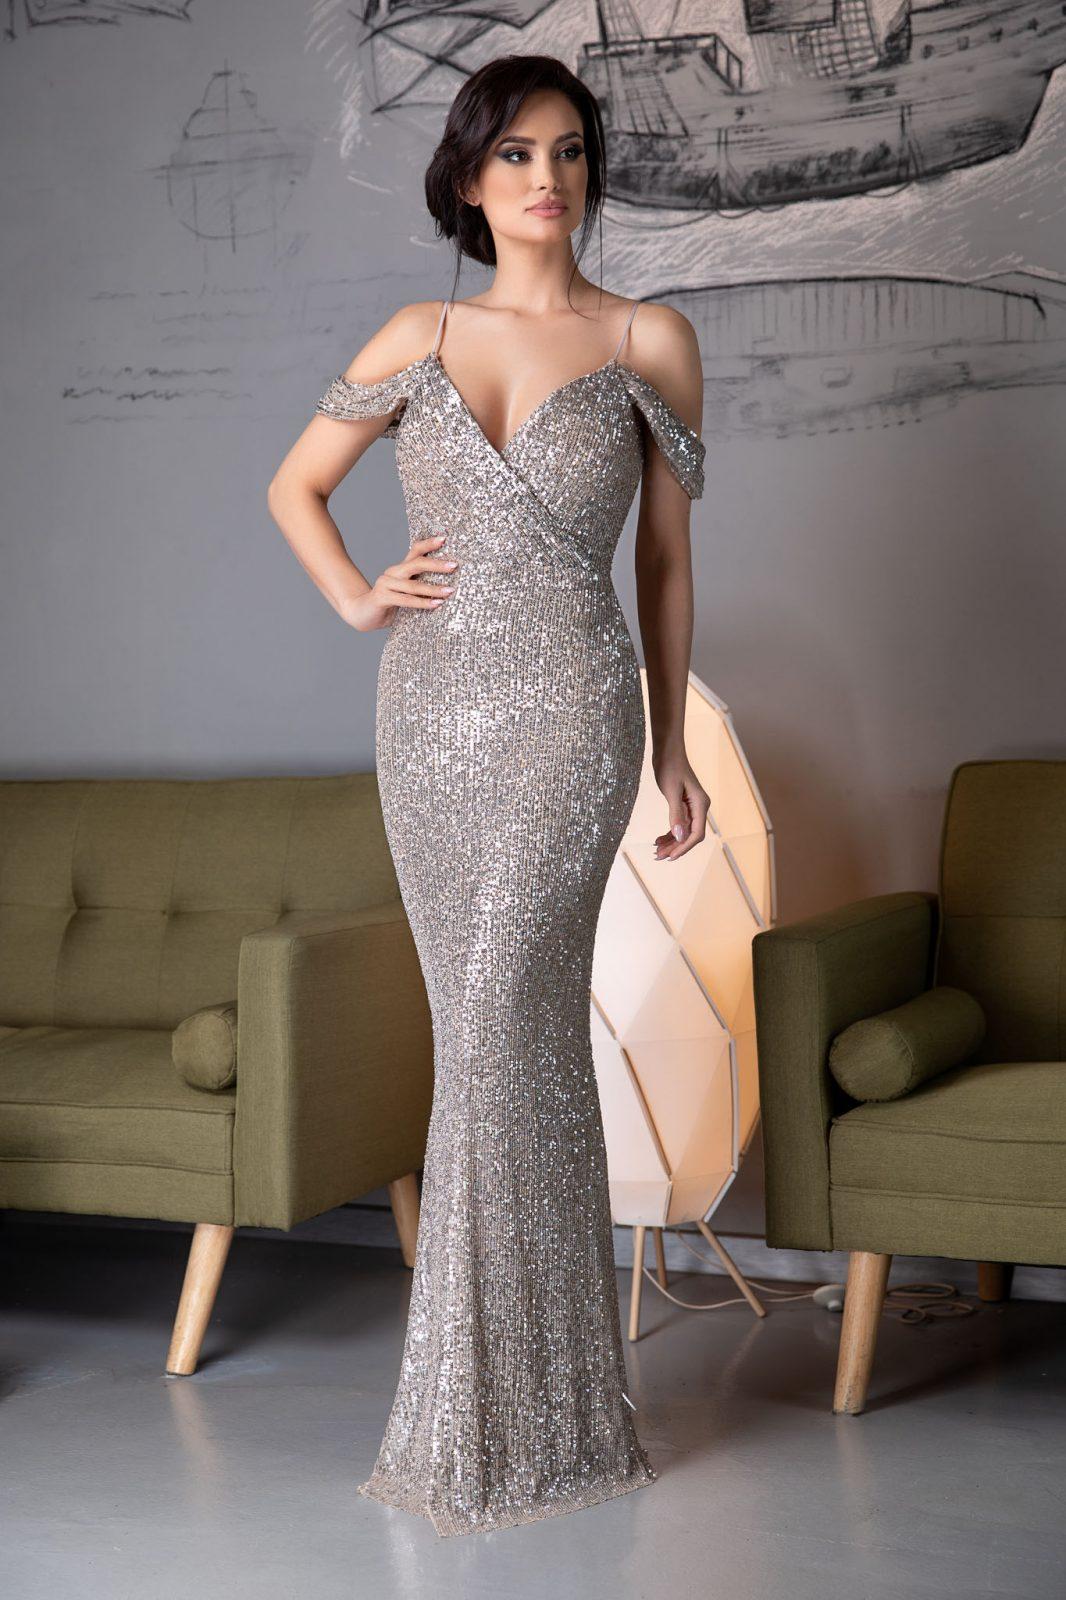 Cherish Nude Dress